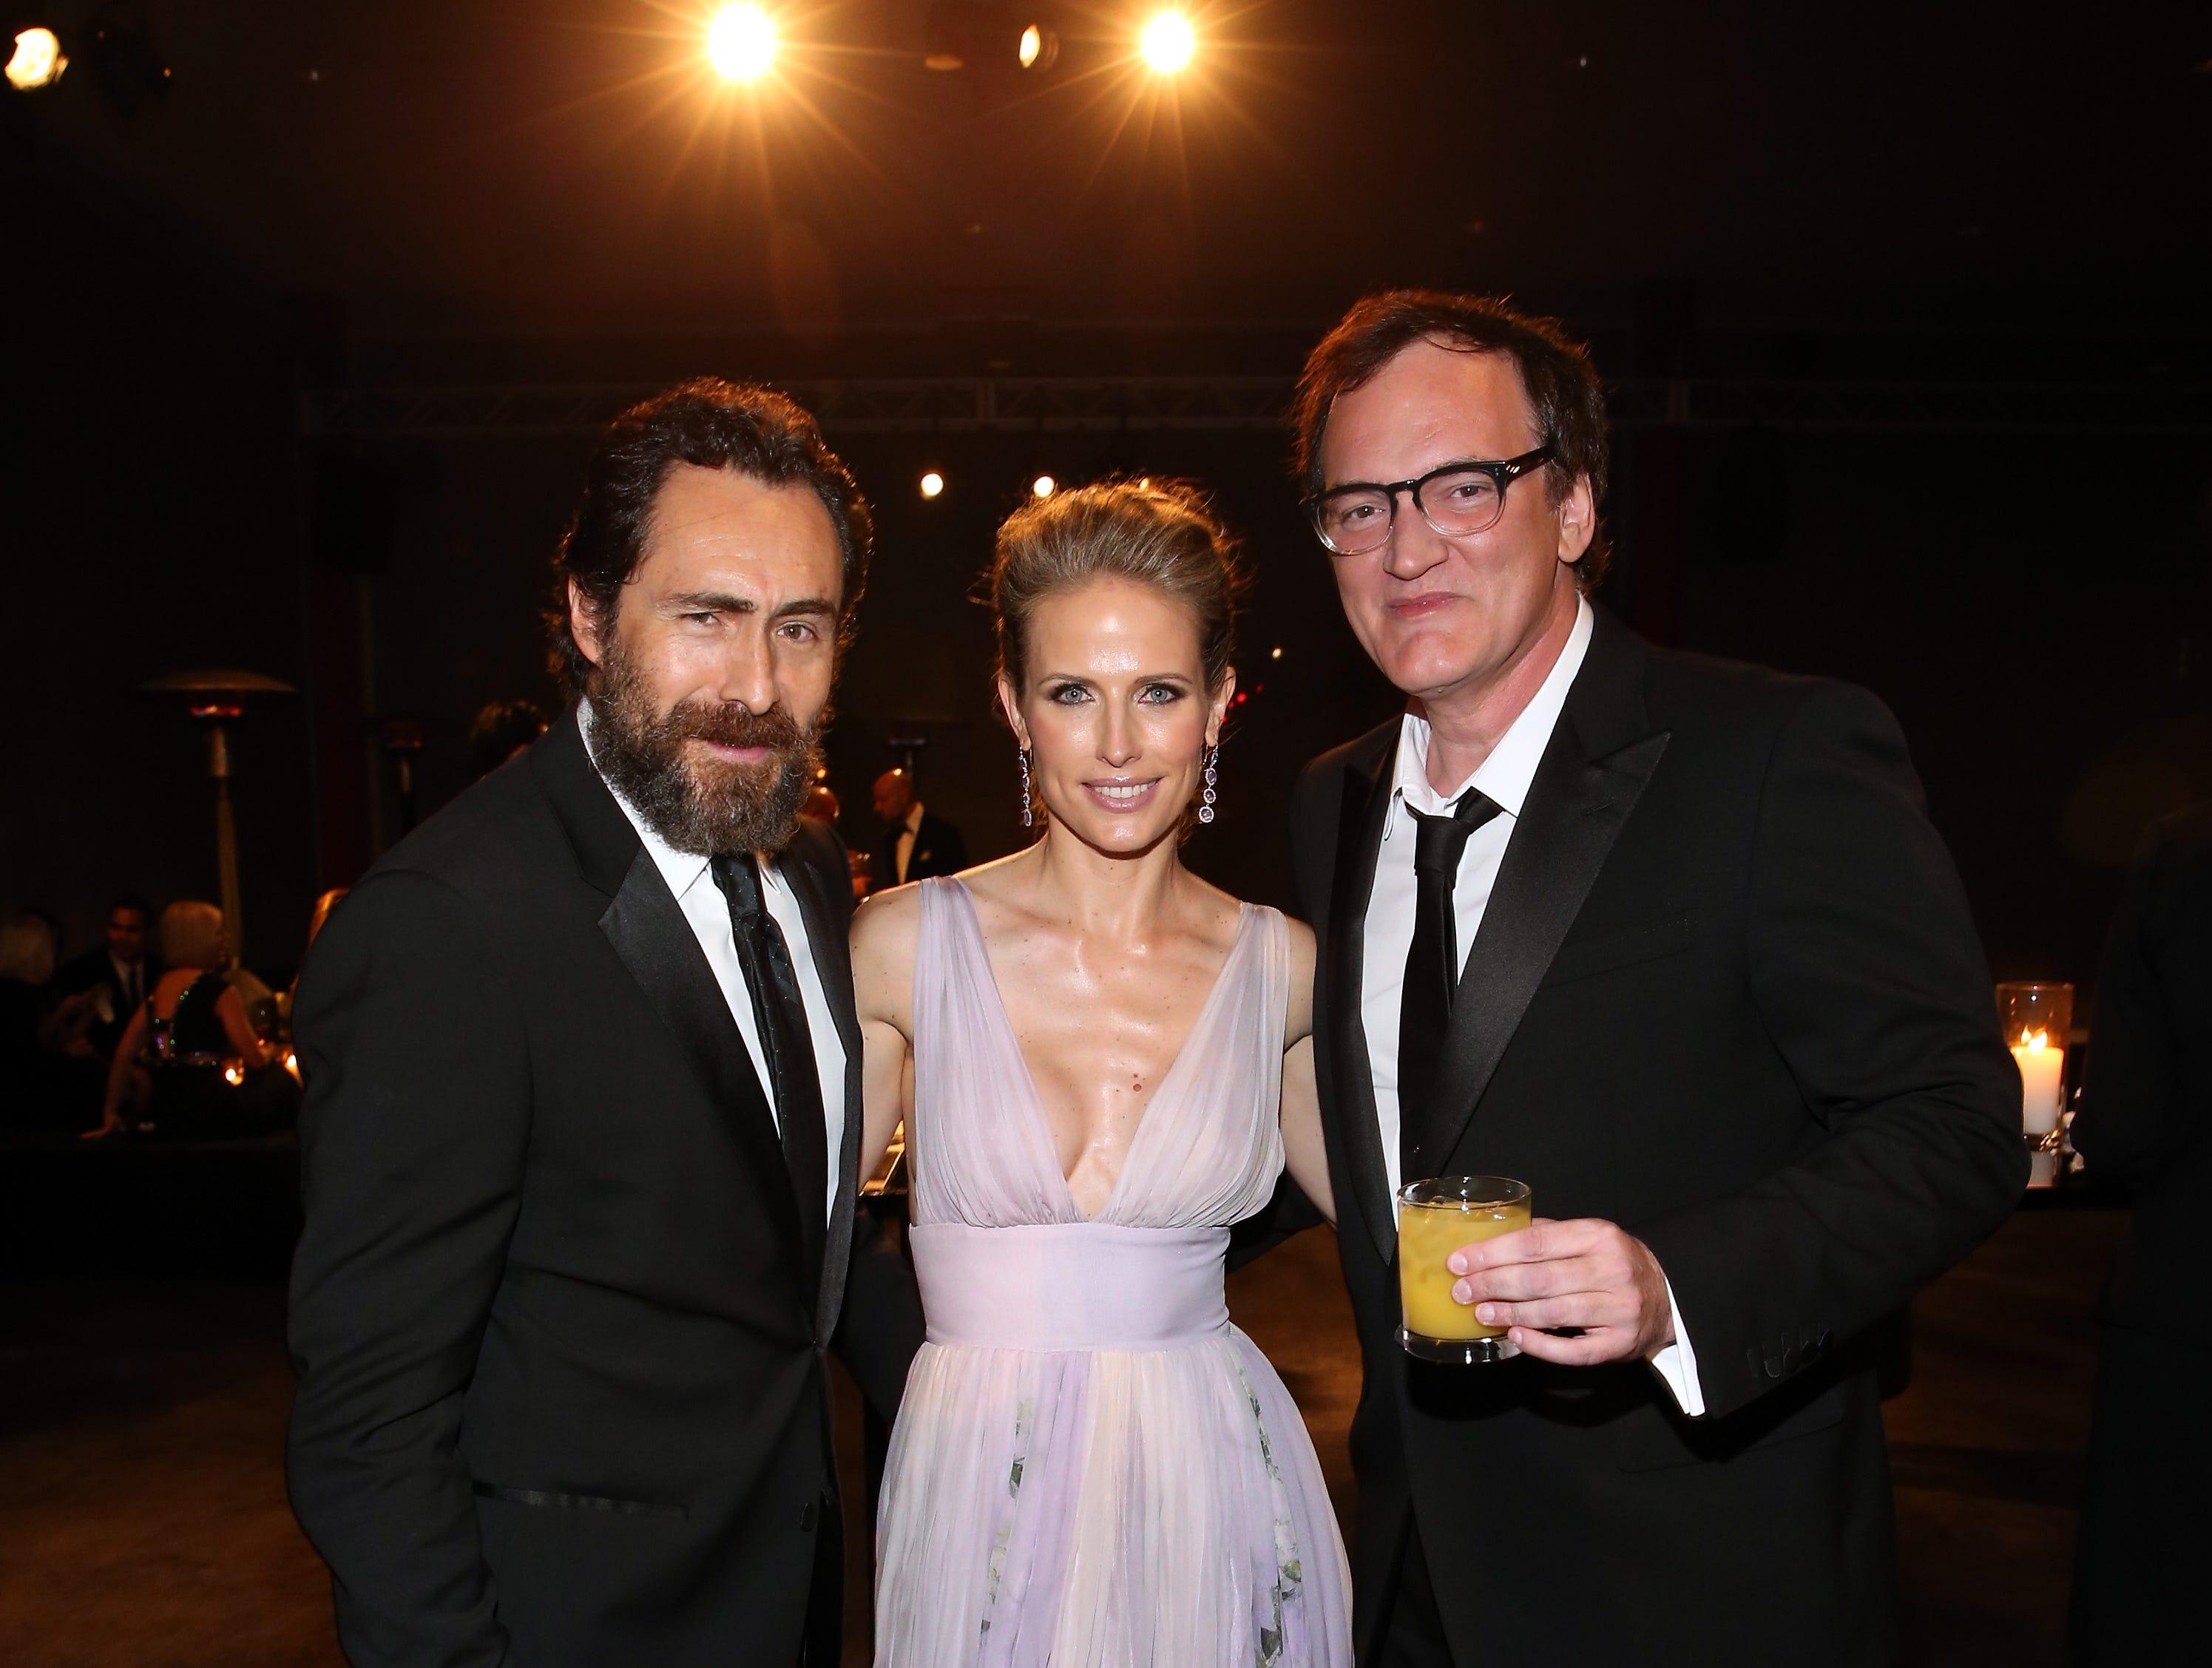 Demian Bichir and Quentin Tarantino flank Stefanie Sherk at the 2014 LACMA Art + Film Gala on Nov. 1, 2014, in Los Angeles.